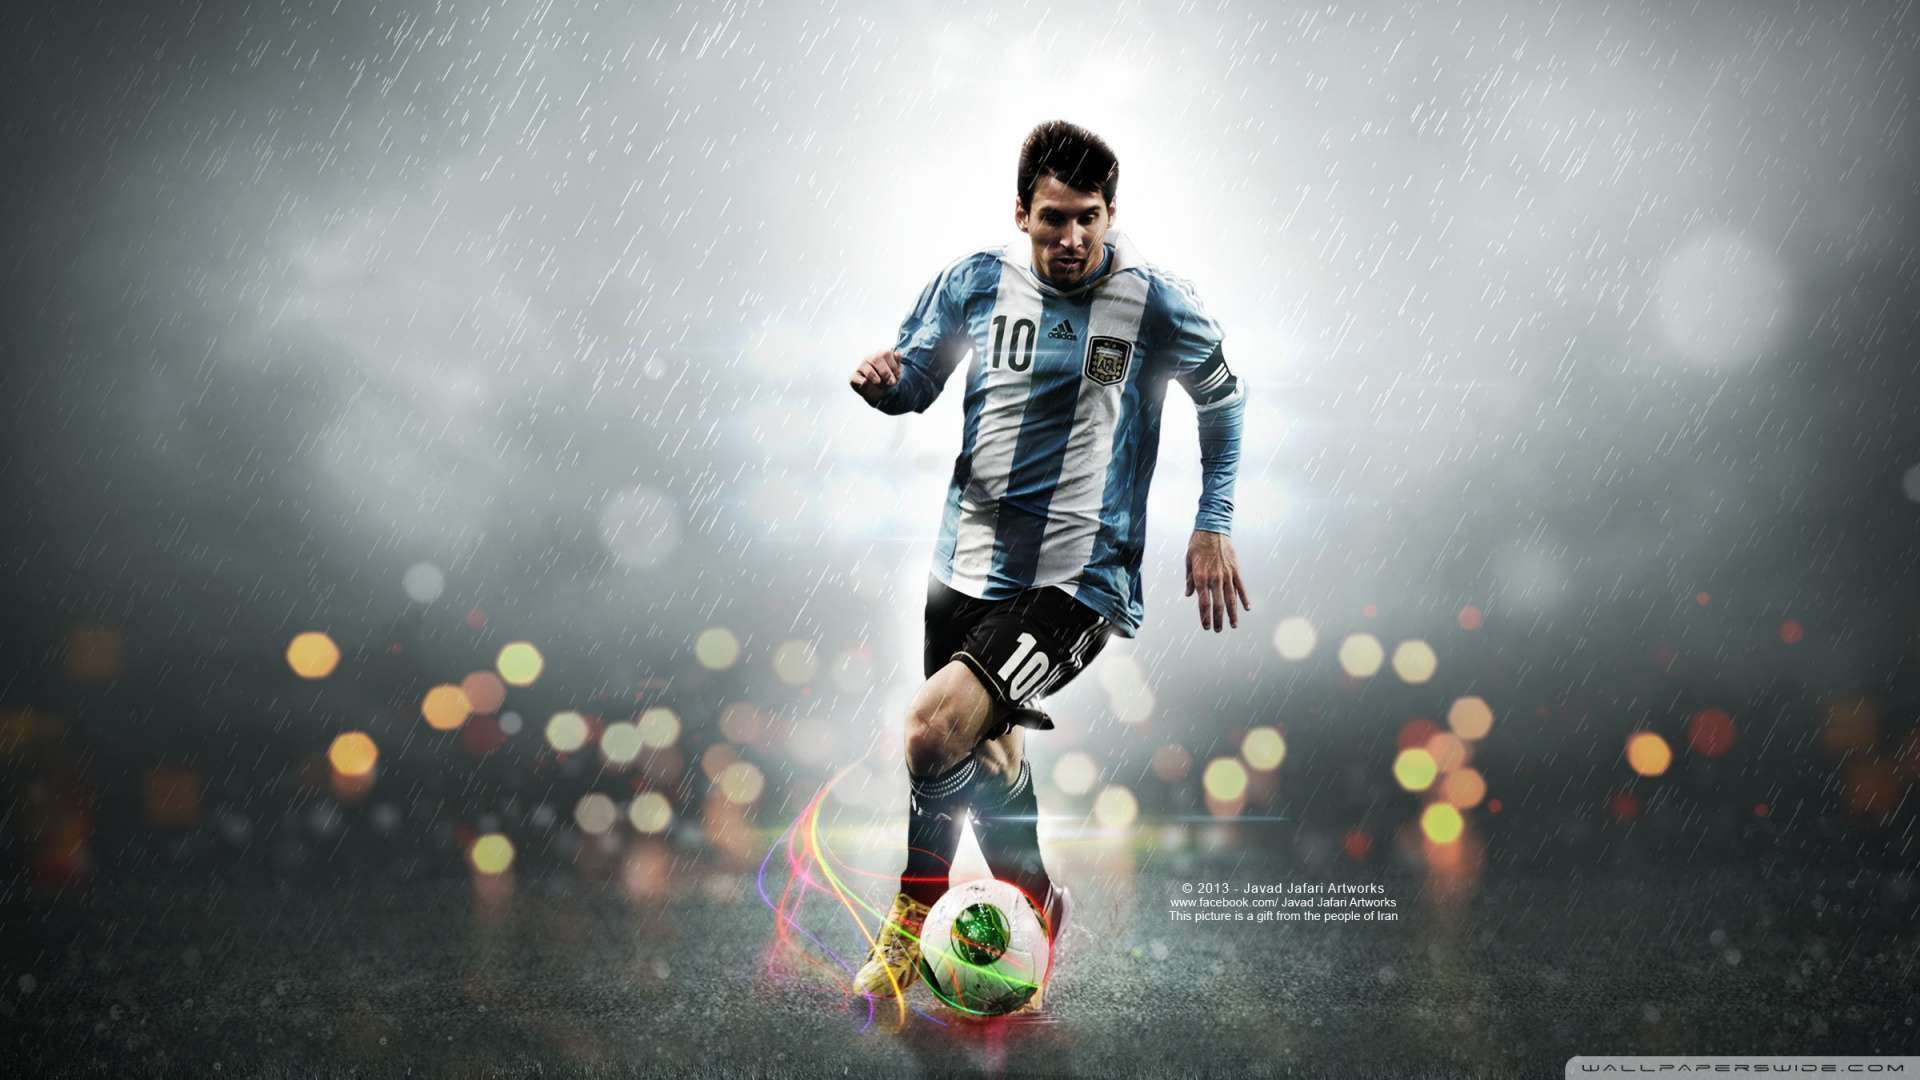 Wallpaper Leo Messi 10 Wallpaper 1080p HD Upload at February 5 2014 1920x1080